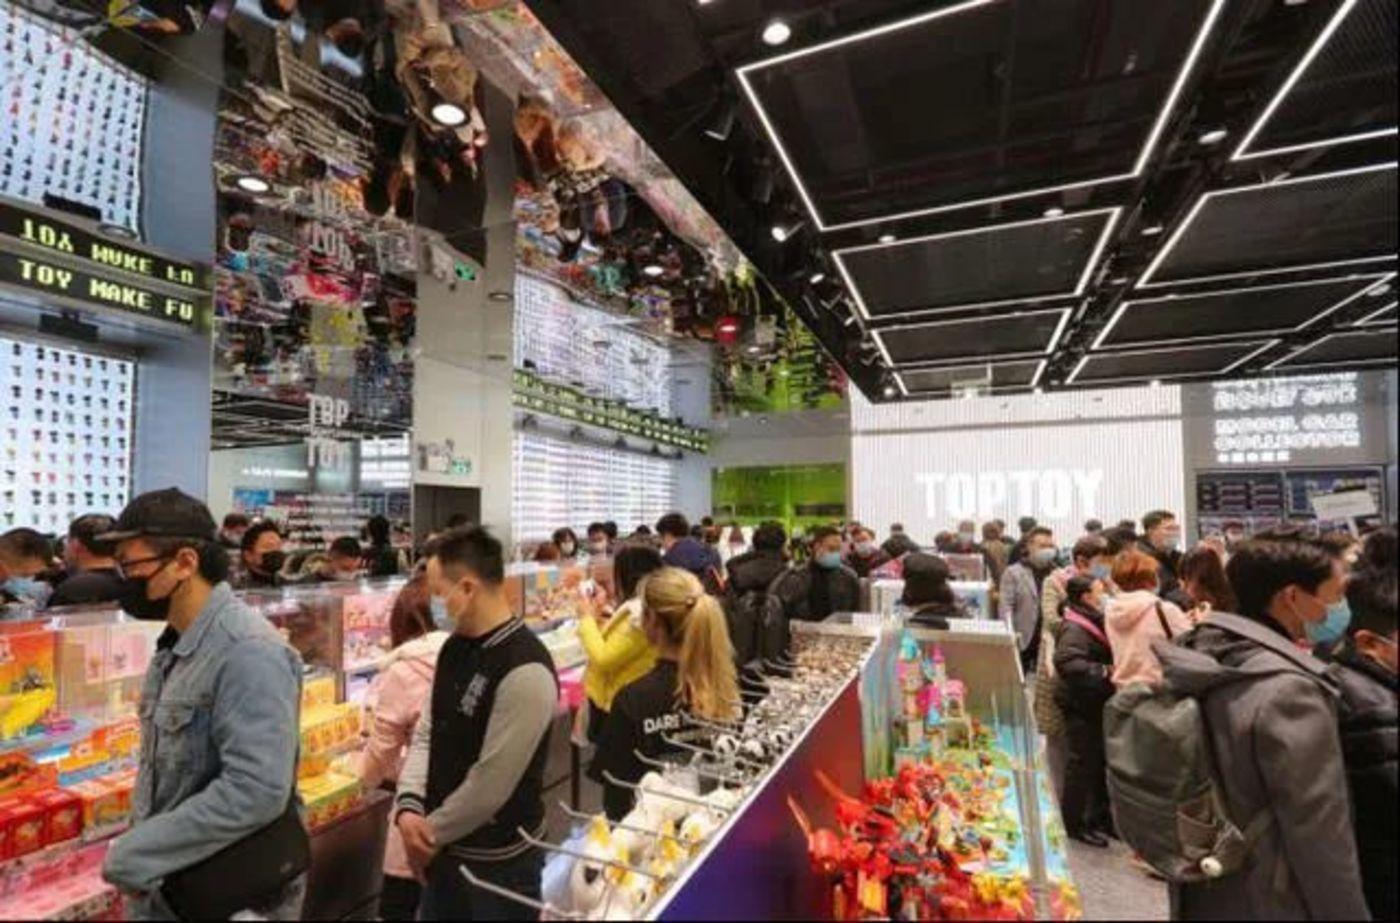 ▲TOP TOY 广州开业首店面积超400㎡,拥有超1200个SKU,汇集了HelloKitty、漫威、迪士尼、DC、火影忍者等52个全球顶级IP及潮玩品牌。